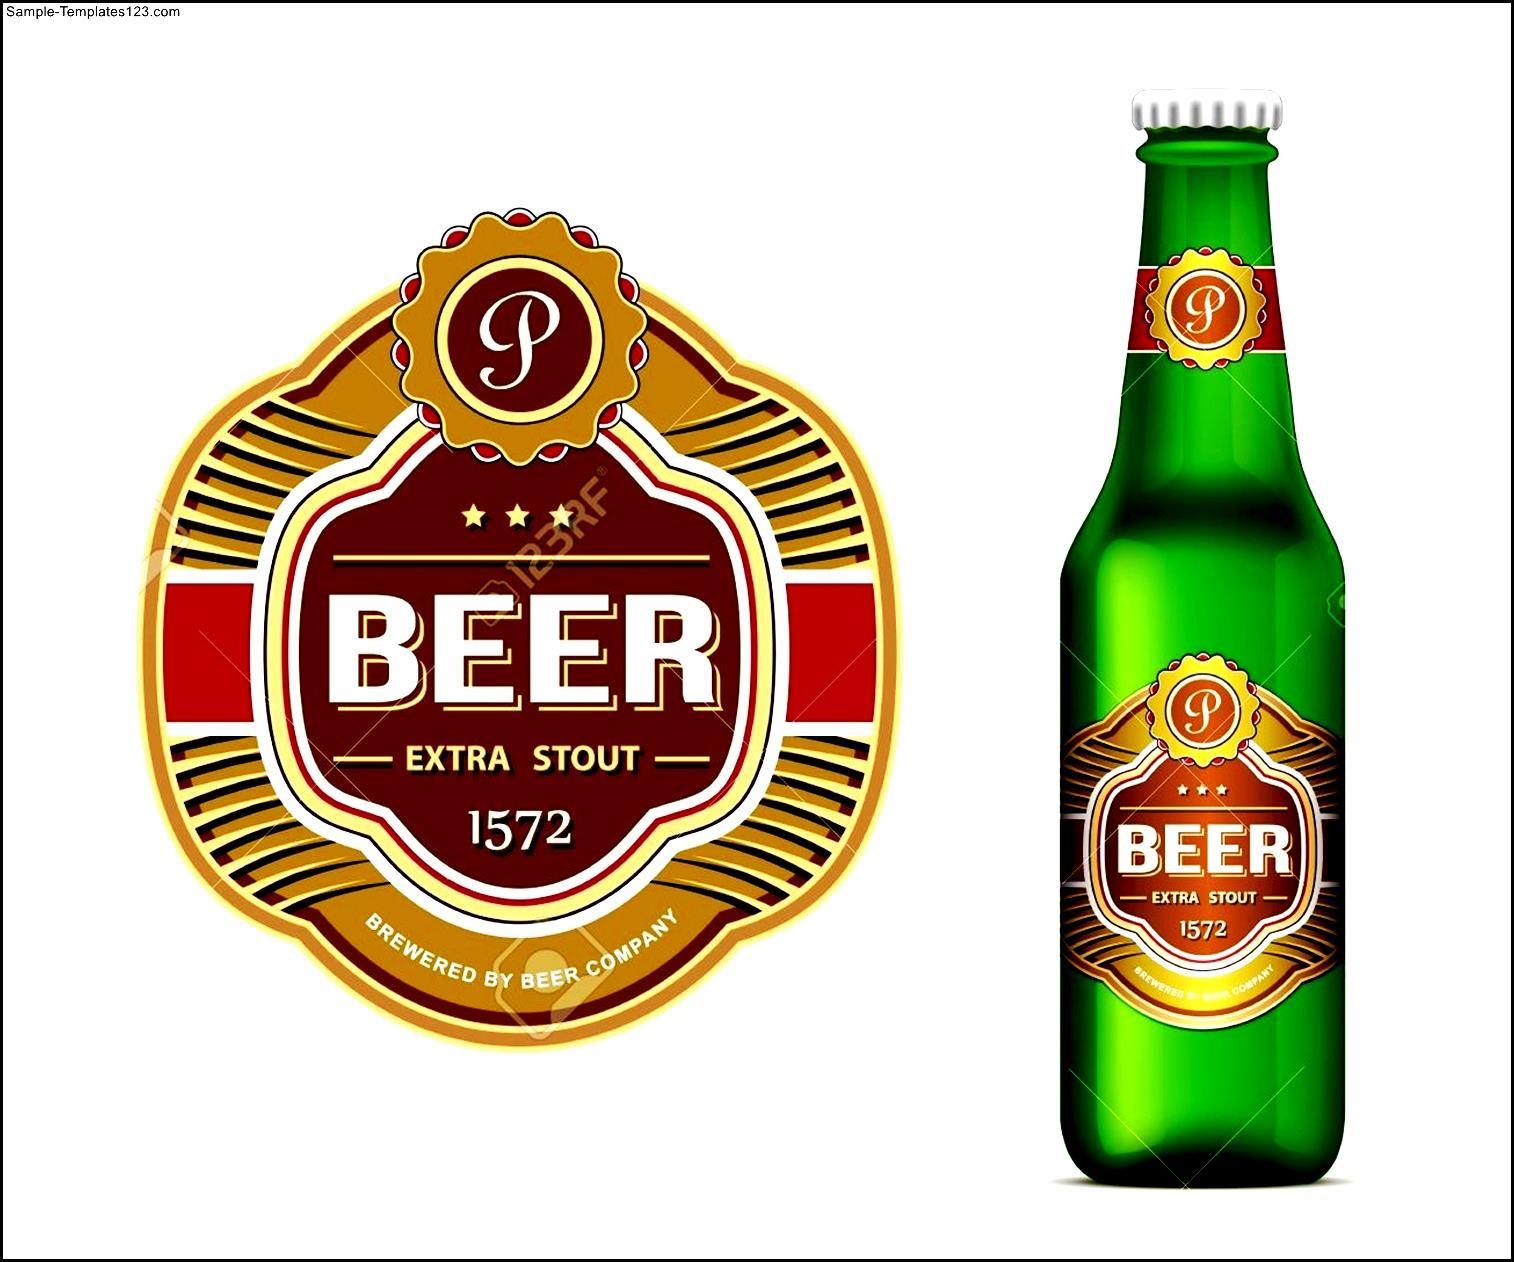 Beer Bottle Label Template Word - Sample Templates - Sample